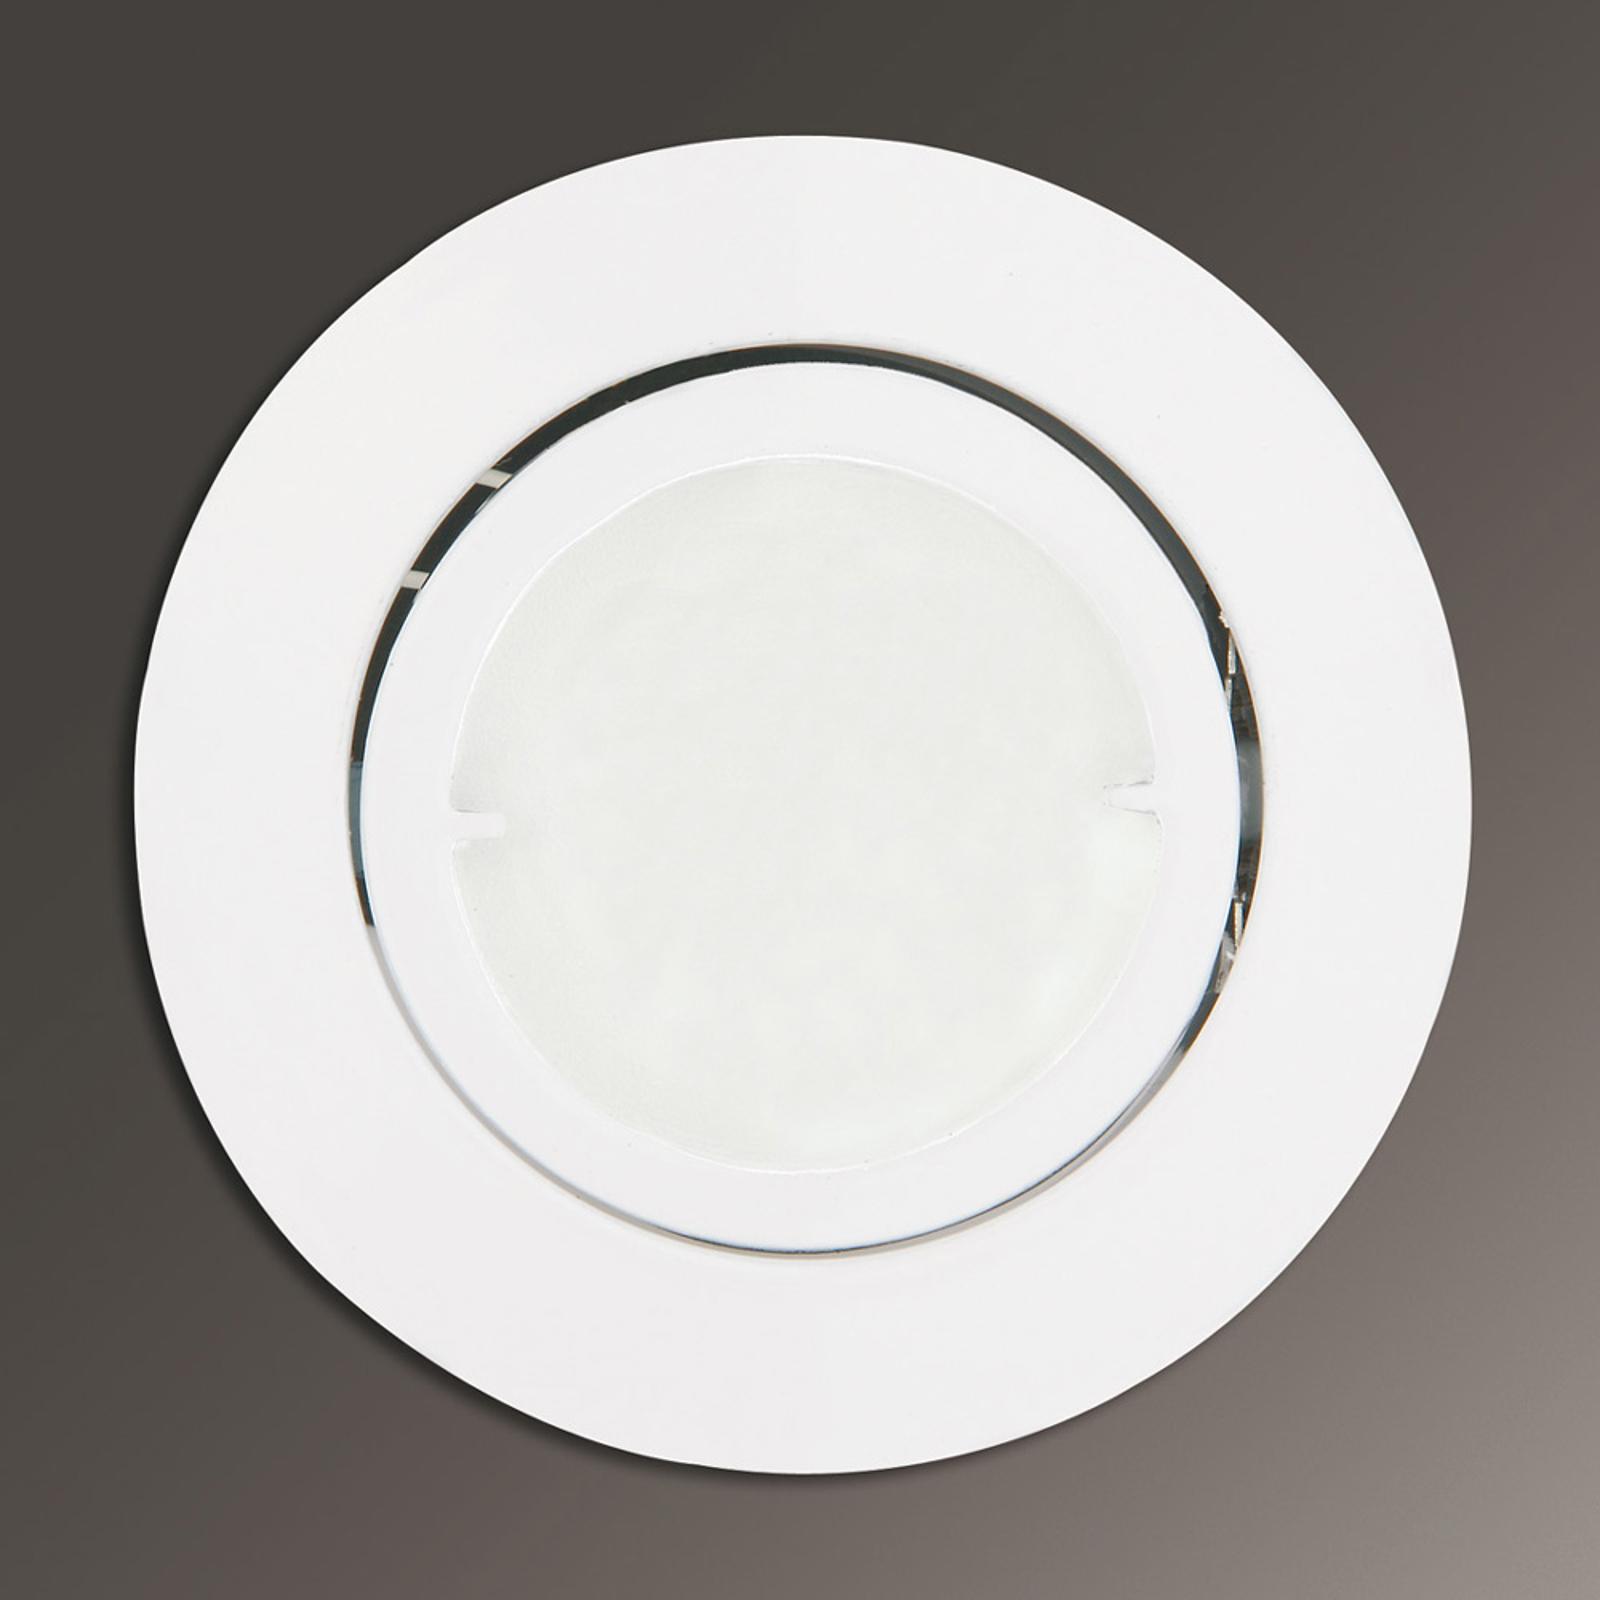 Joanie - spot LED incasso in bianco, rotondo